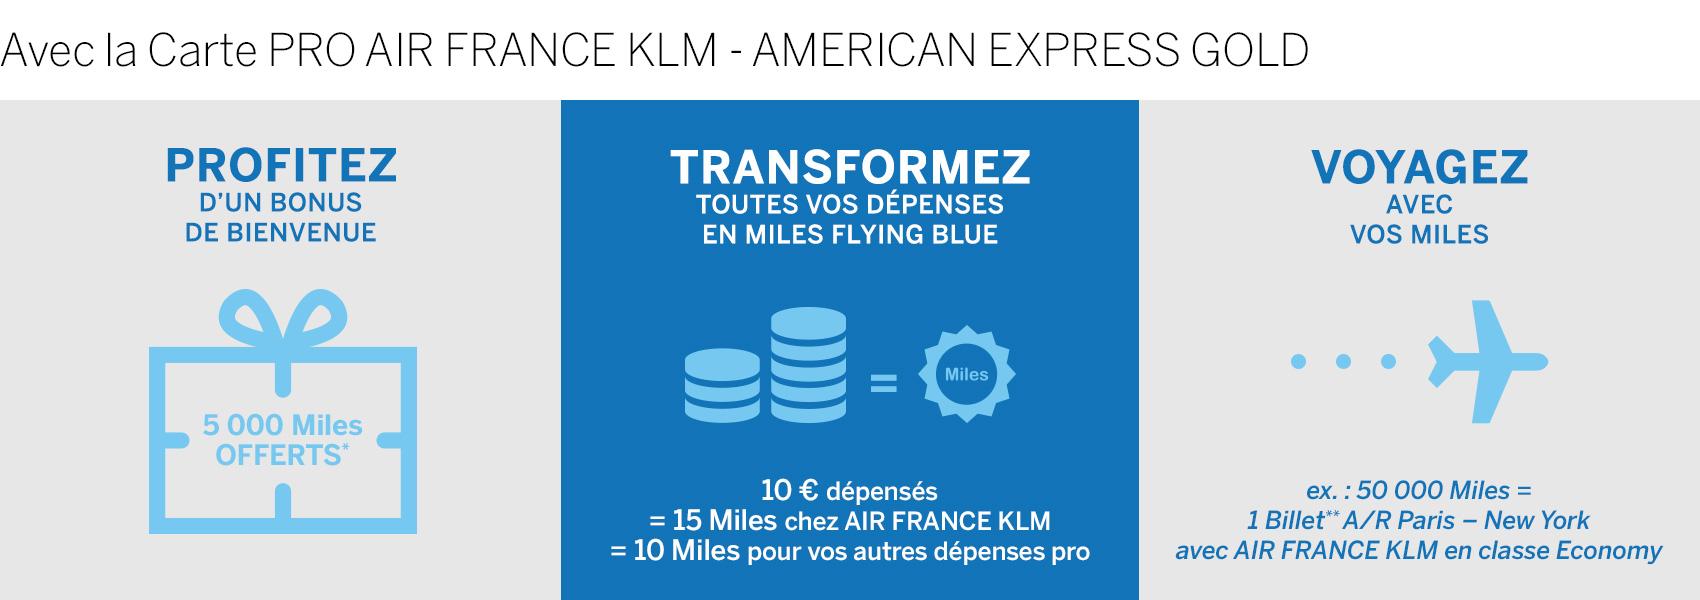 Carte American Express Gold Societe Generale.Carte Pro Air France Klm American Express Gold